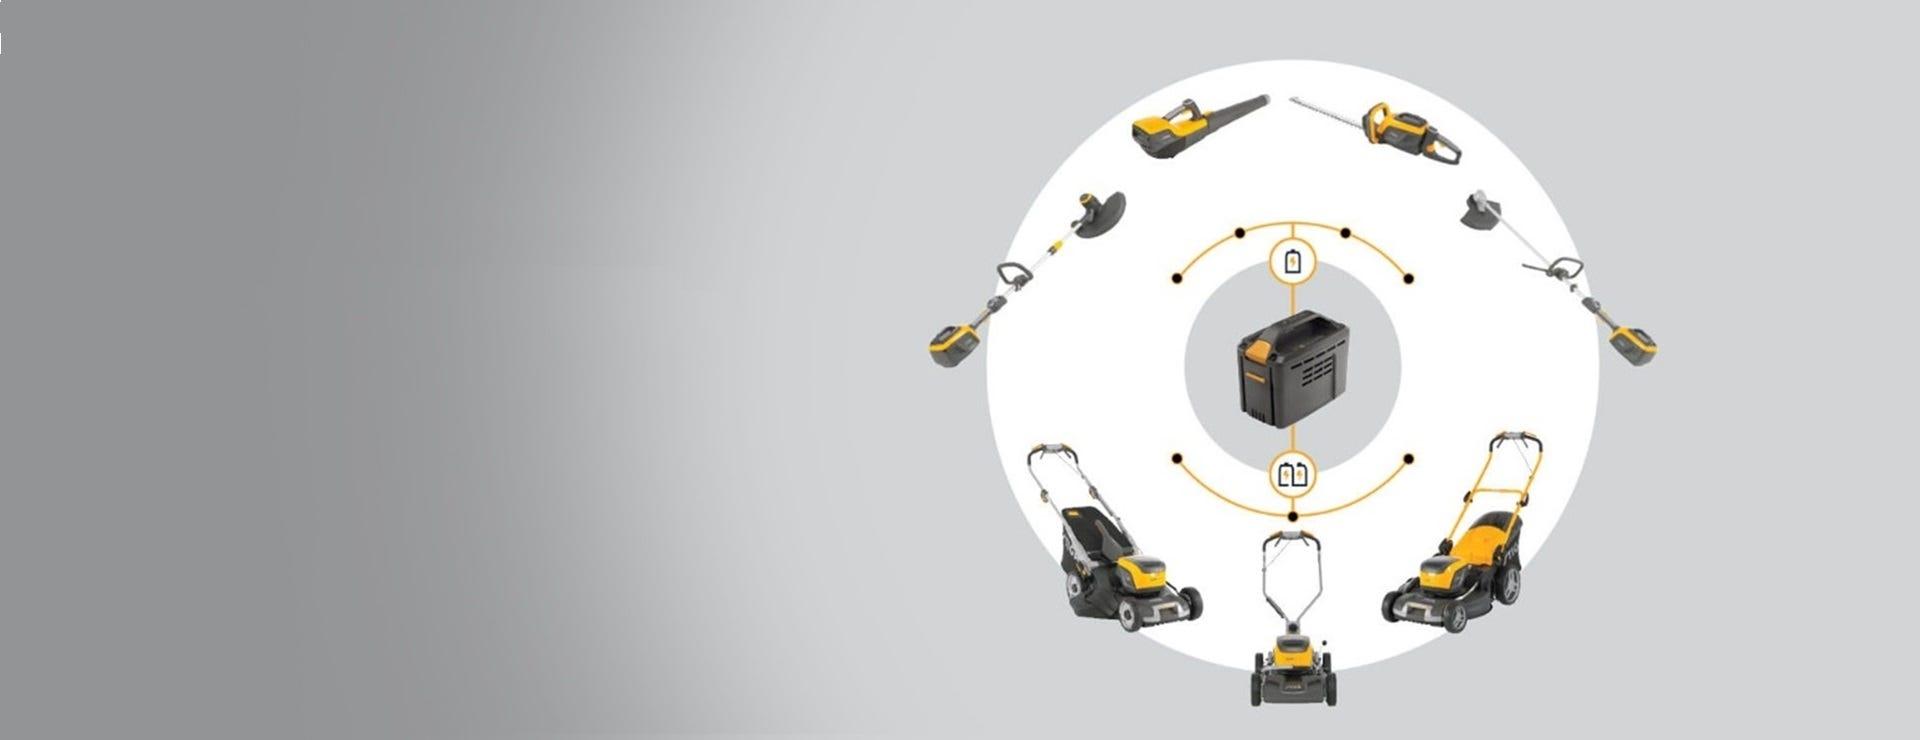 stiga-500 series-systeme-batterie